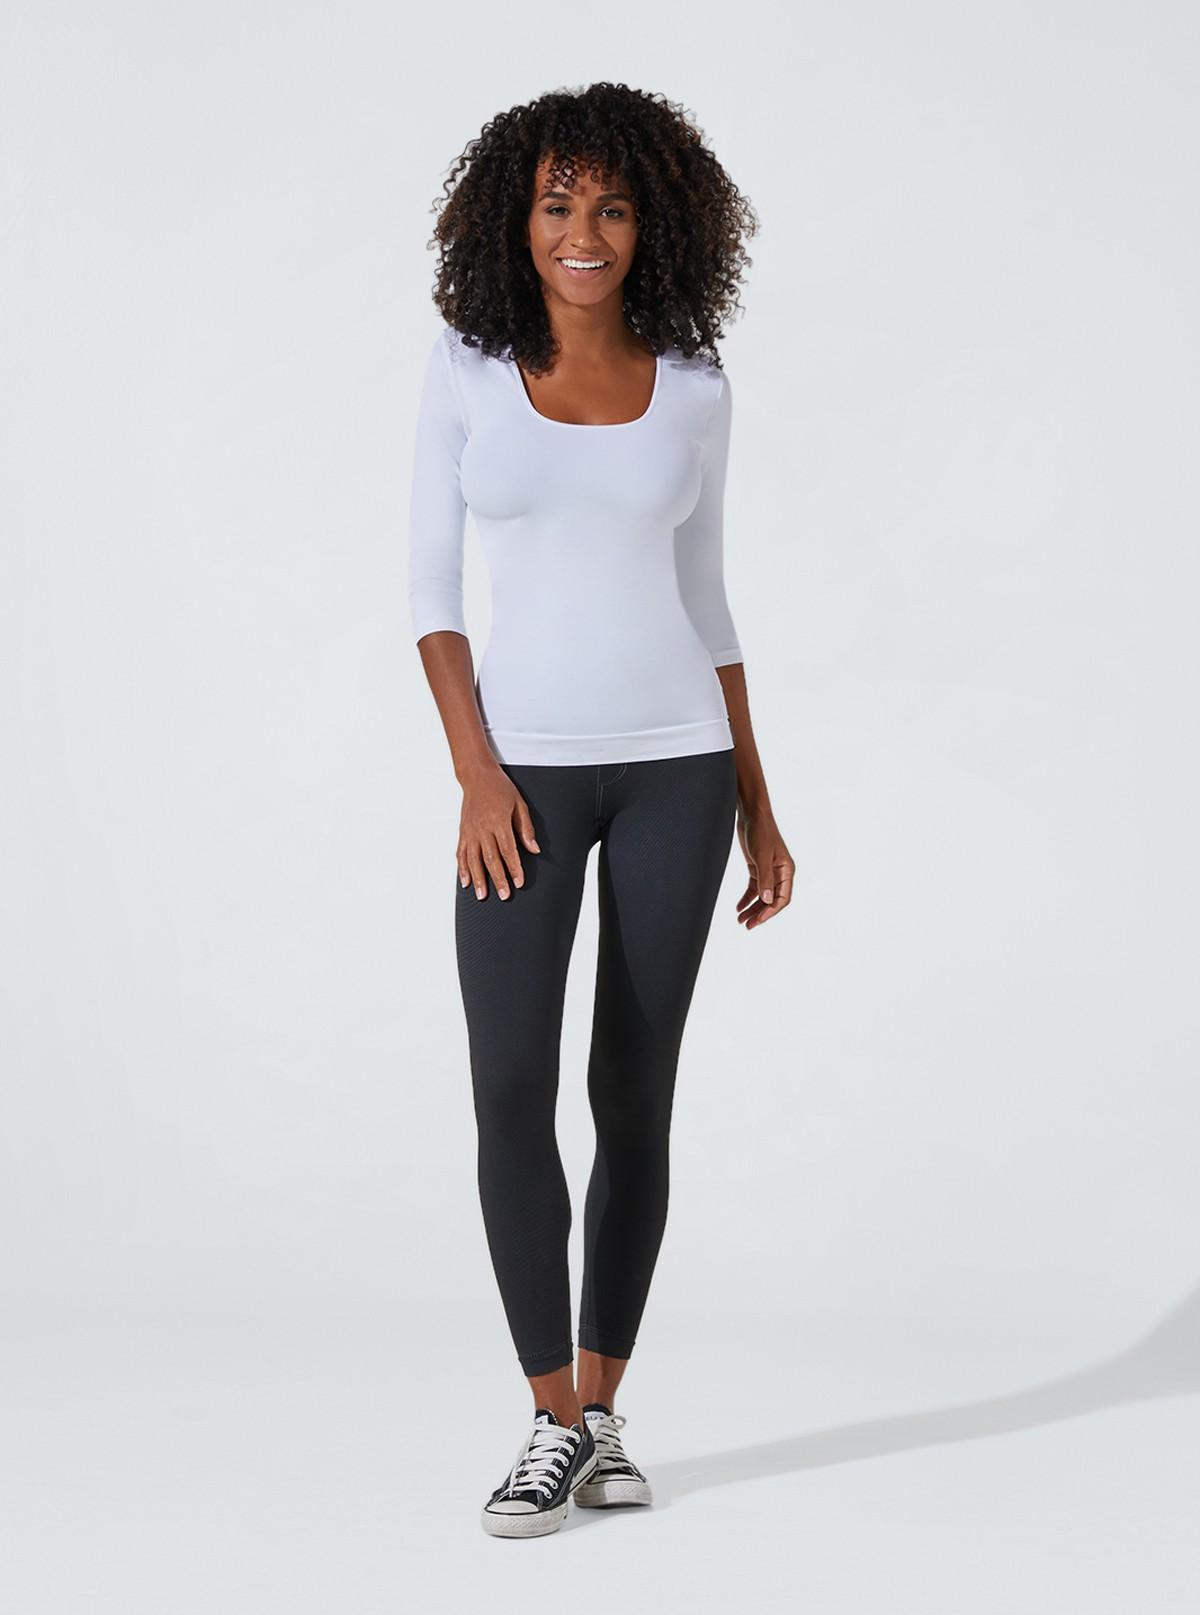 Traje moda para mujer: Camiseta con mangas 3/4 + Jegging deep black